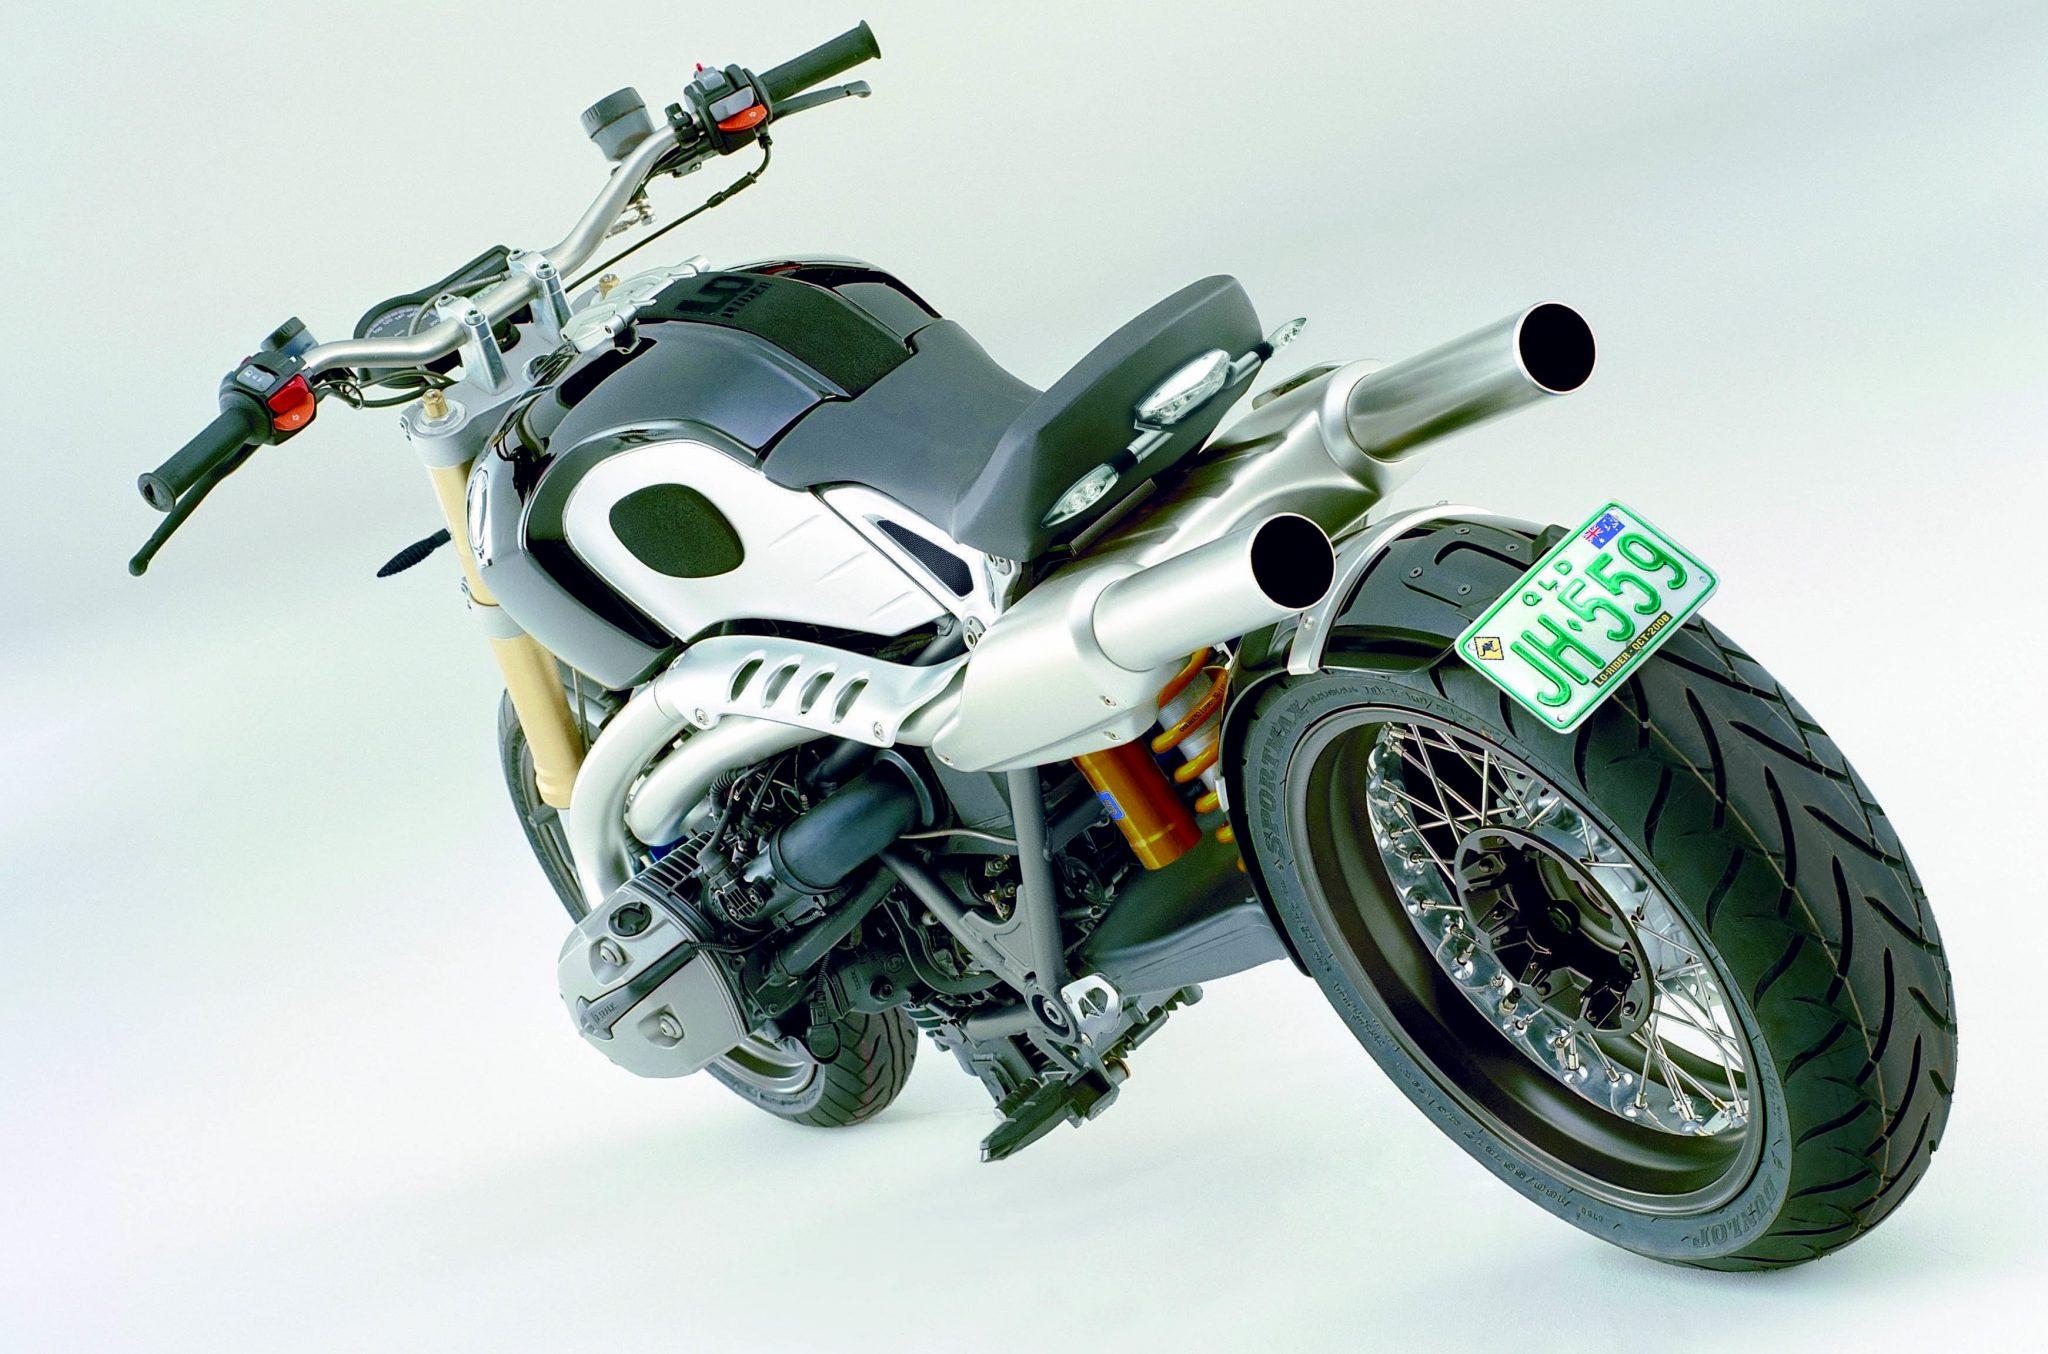 3studie2 BMW Lo Rider Concept